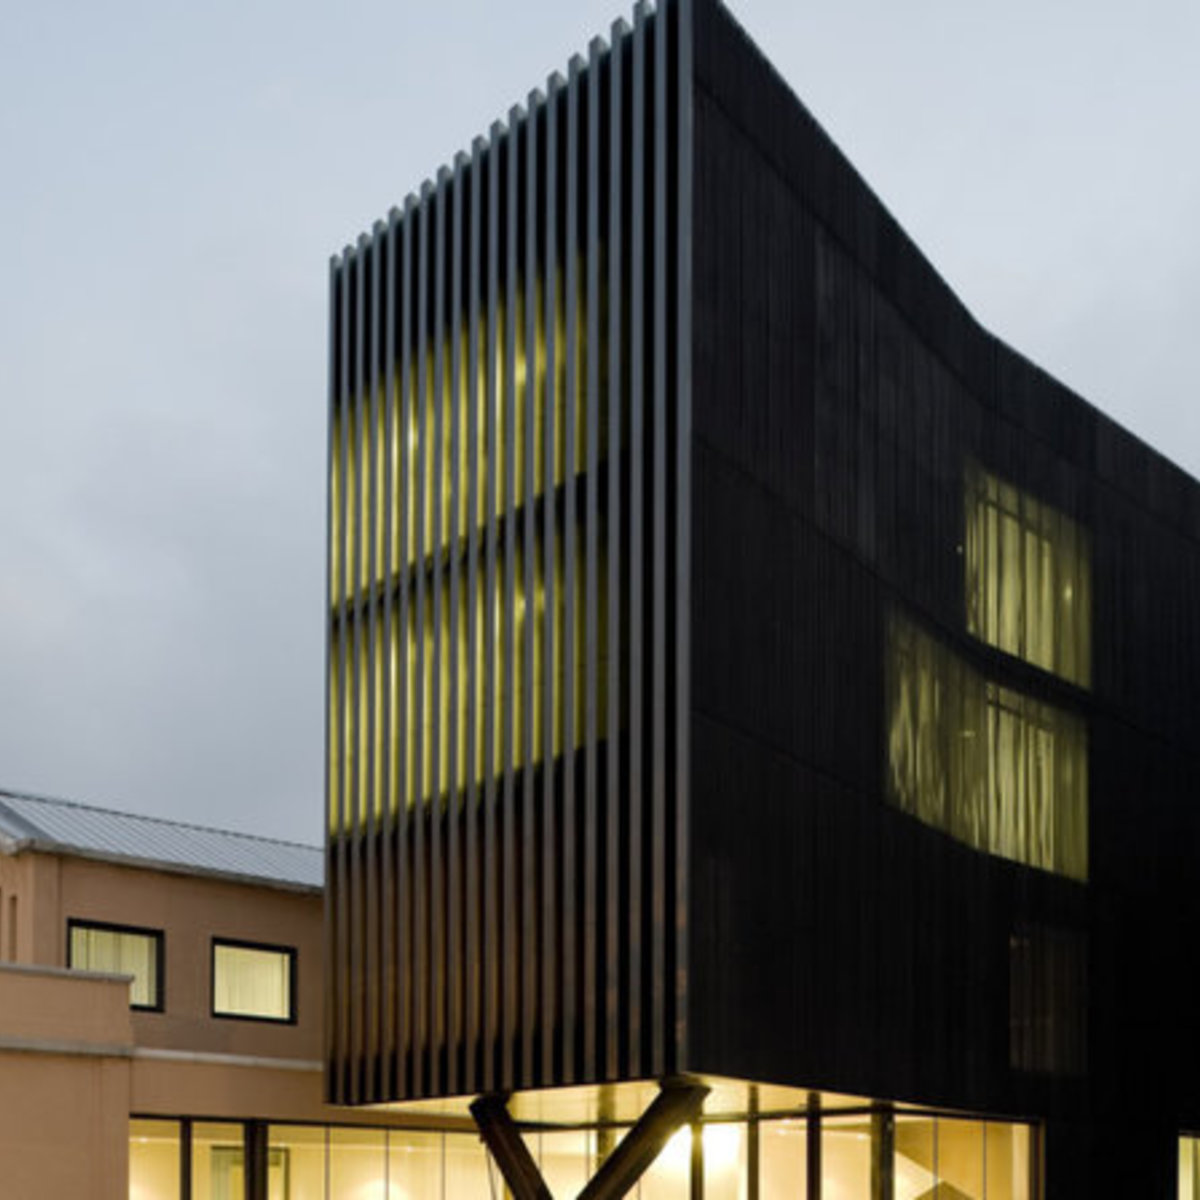 Camps-Felip: Ferreries Cultural Centre in Tortosa